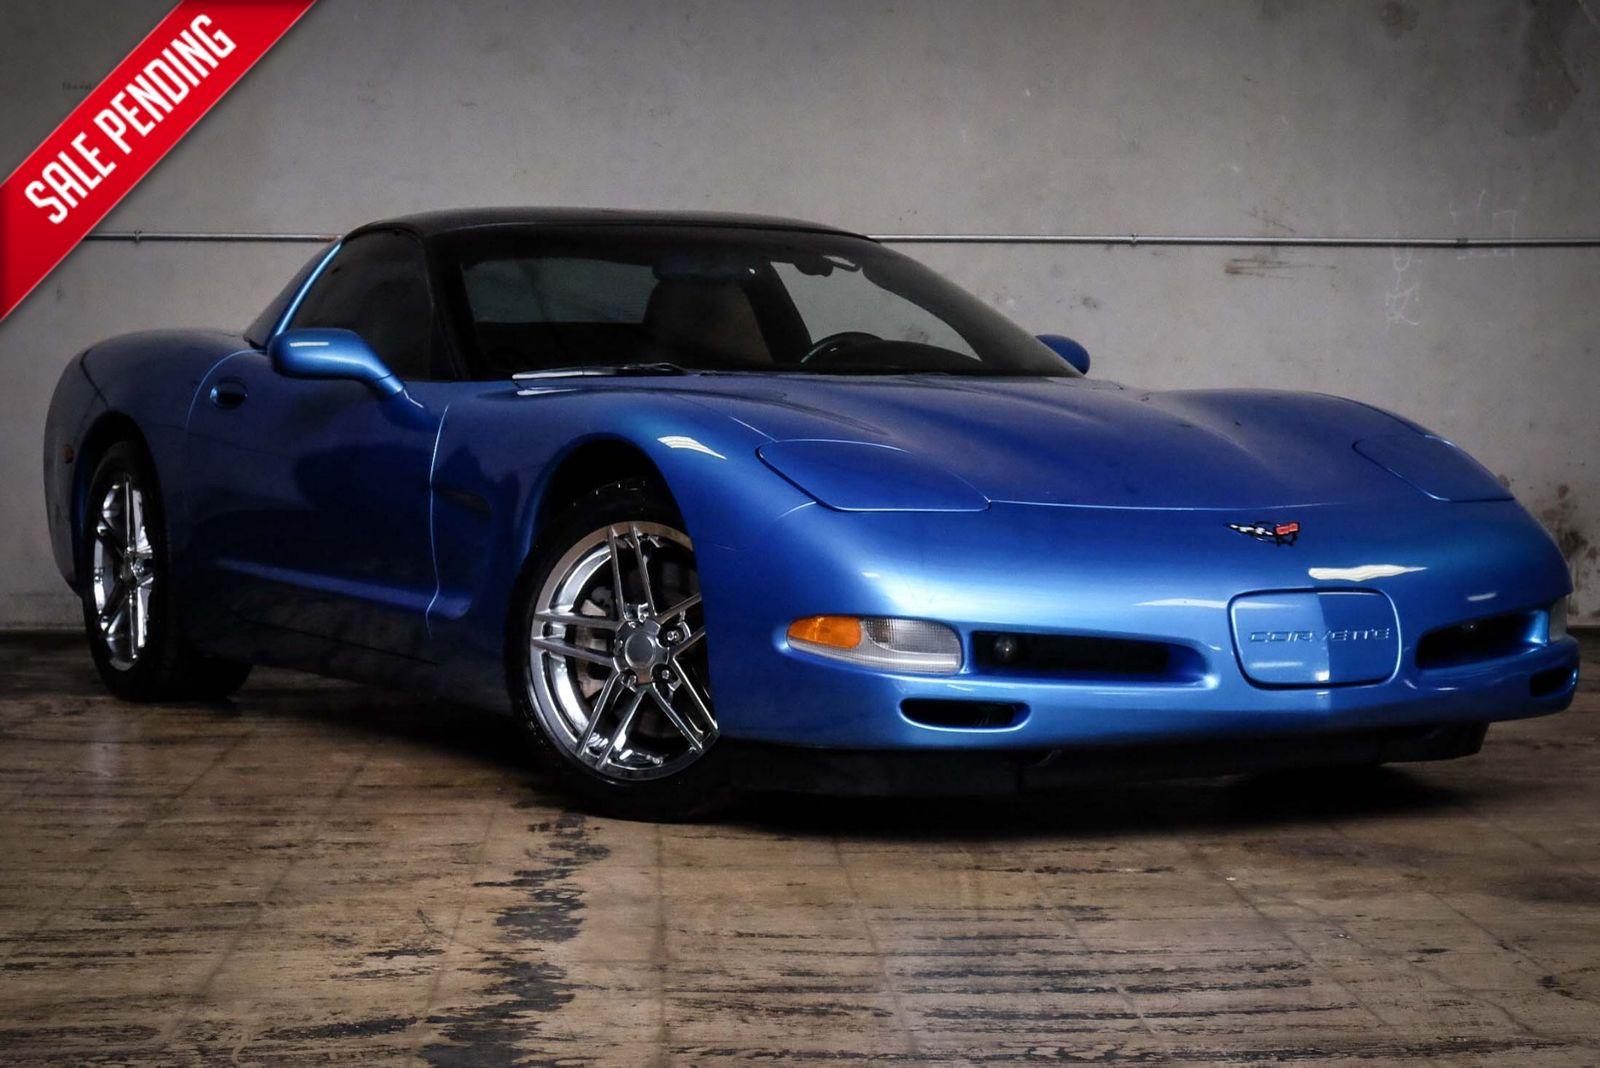 2000 Blue Chevrolet Corvette   | C5 Corvette Photo 1